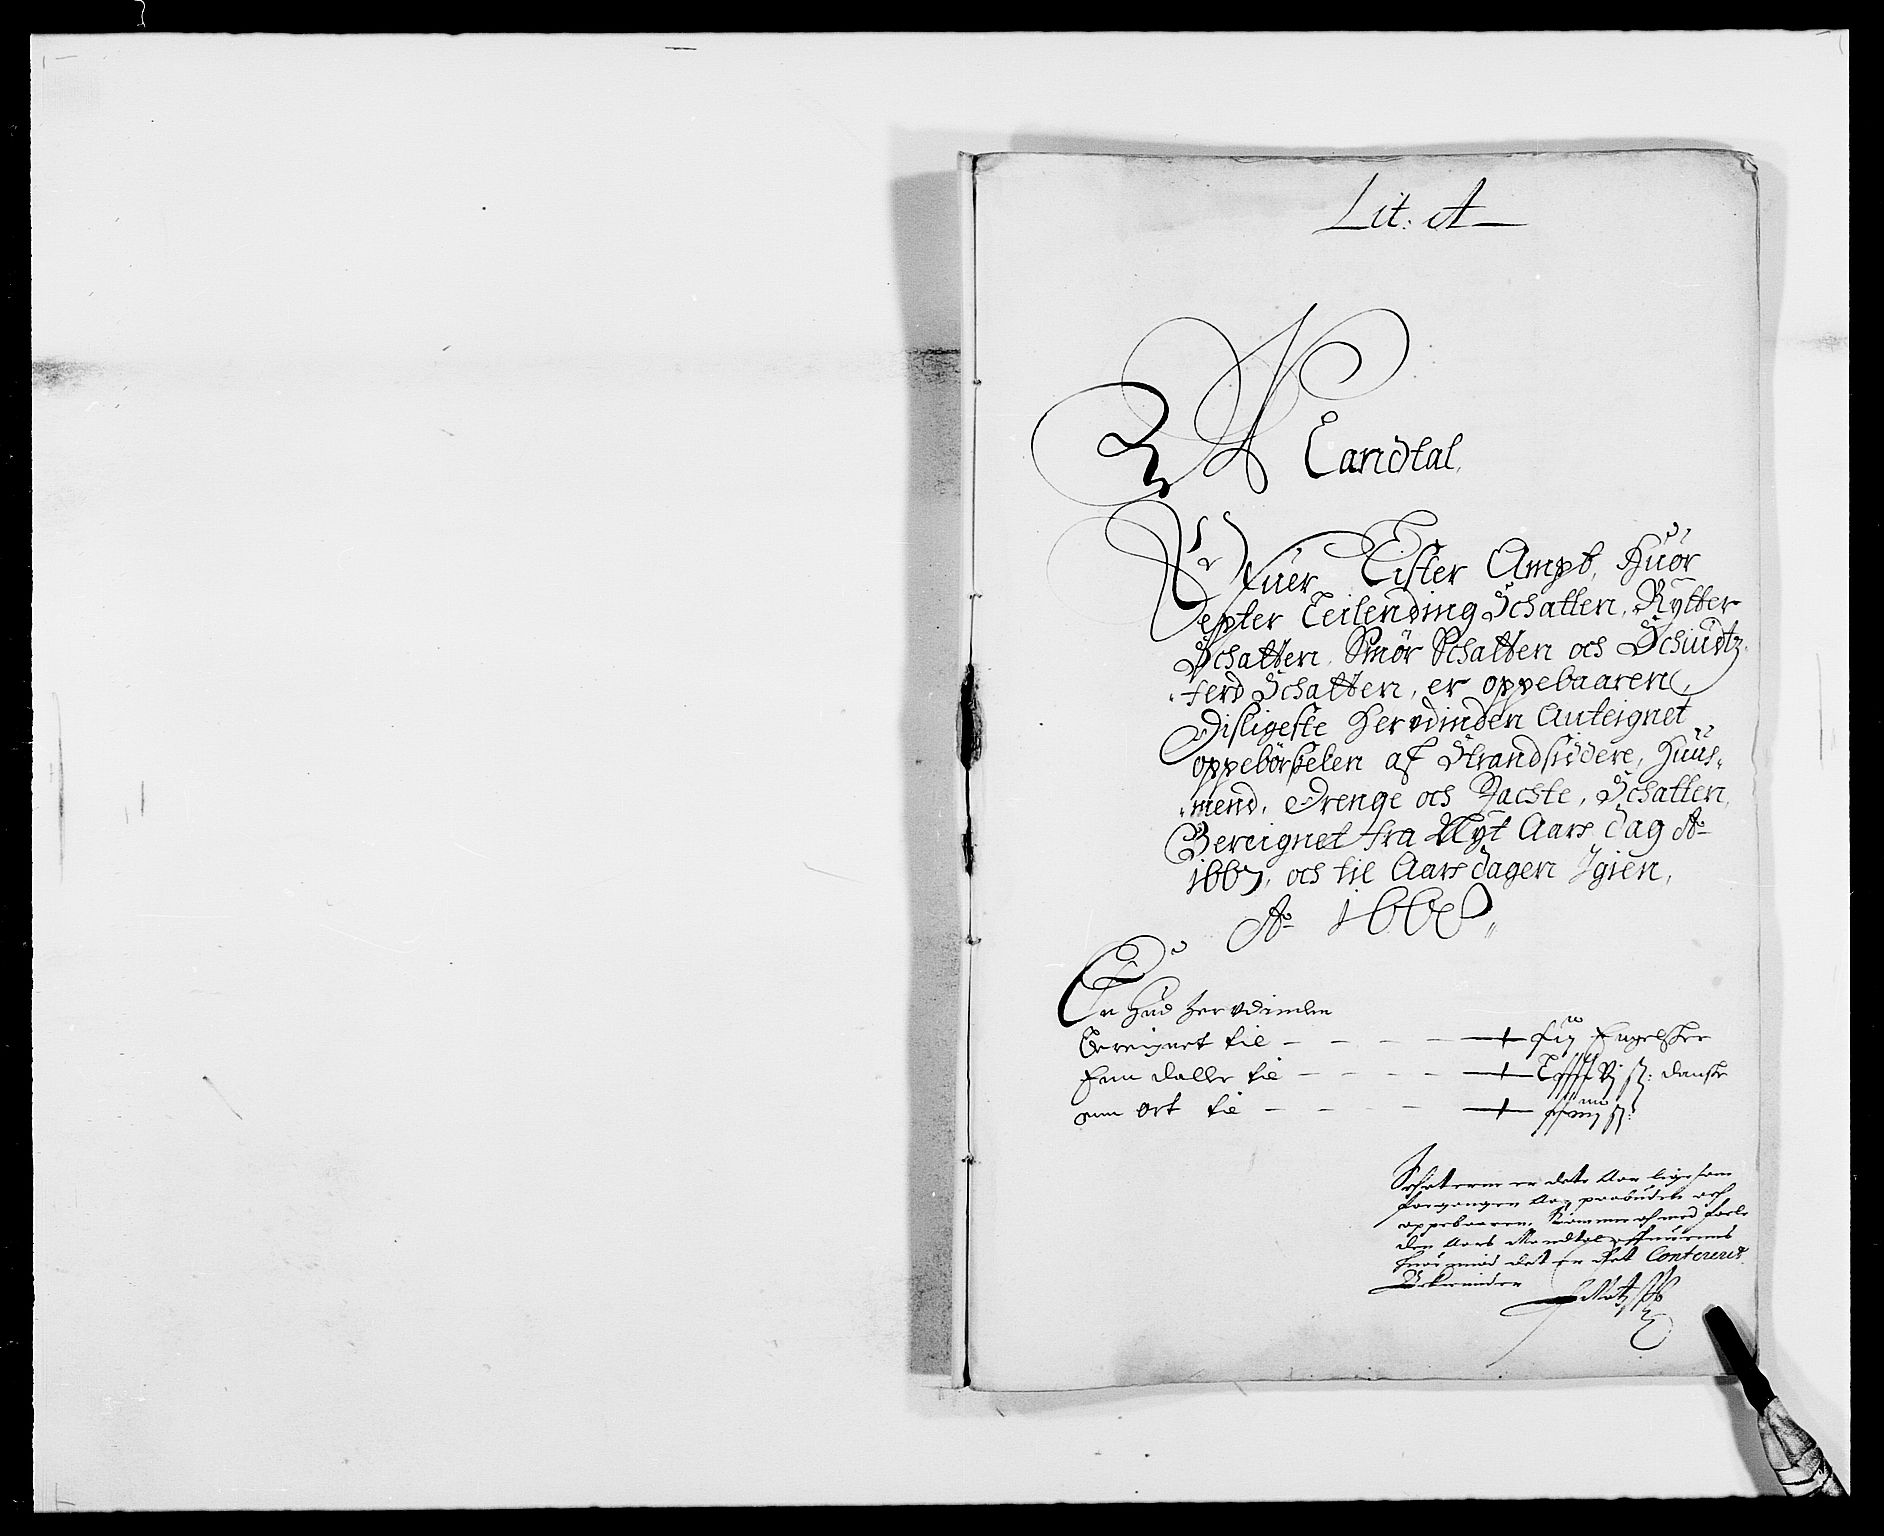 RA, Rentekammeret inntil 1814, Reviderte regnskaper, Fogderegnskap, R41/L2524: Fogderegnskap Lista, 1665-1668, s. 271